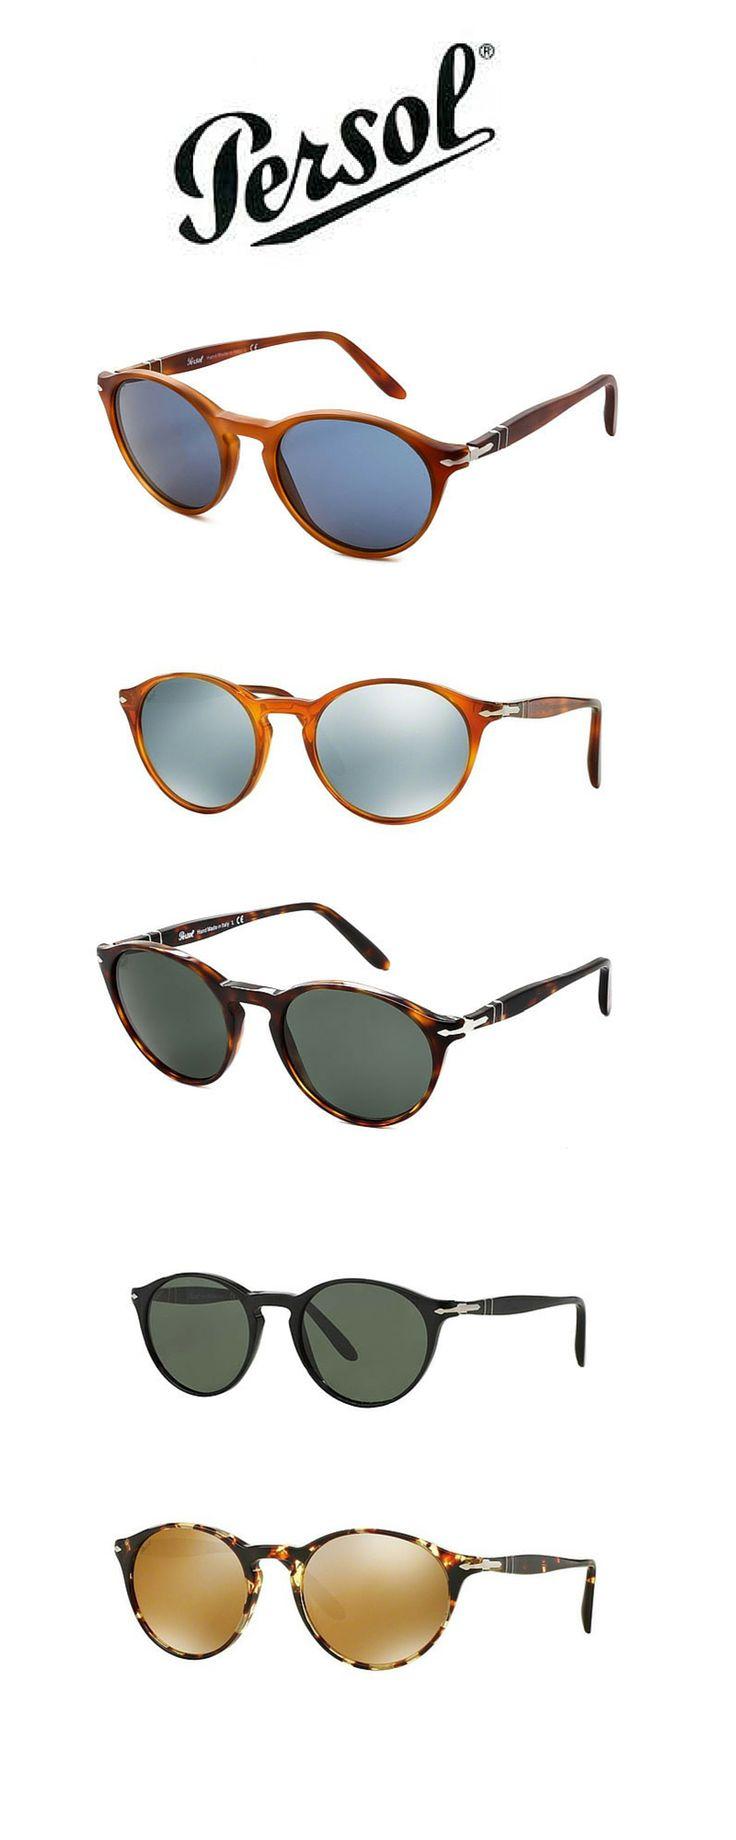 Persol PO3092  #sunglasses collection : http://www.smartbuyglasses.com/designer-sunglasses/Persol/Persol-PO3092SM-904130-294787.html